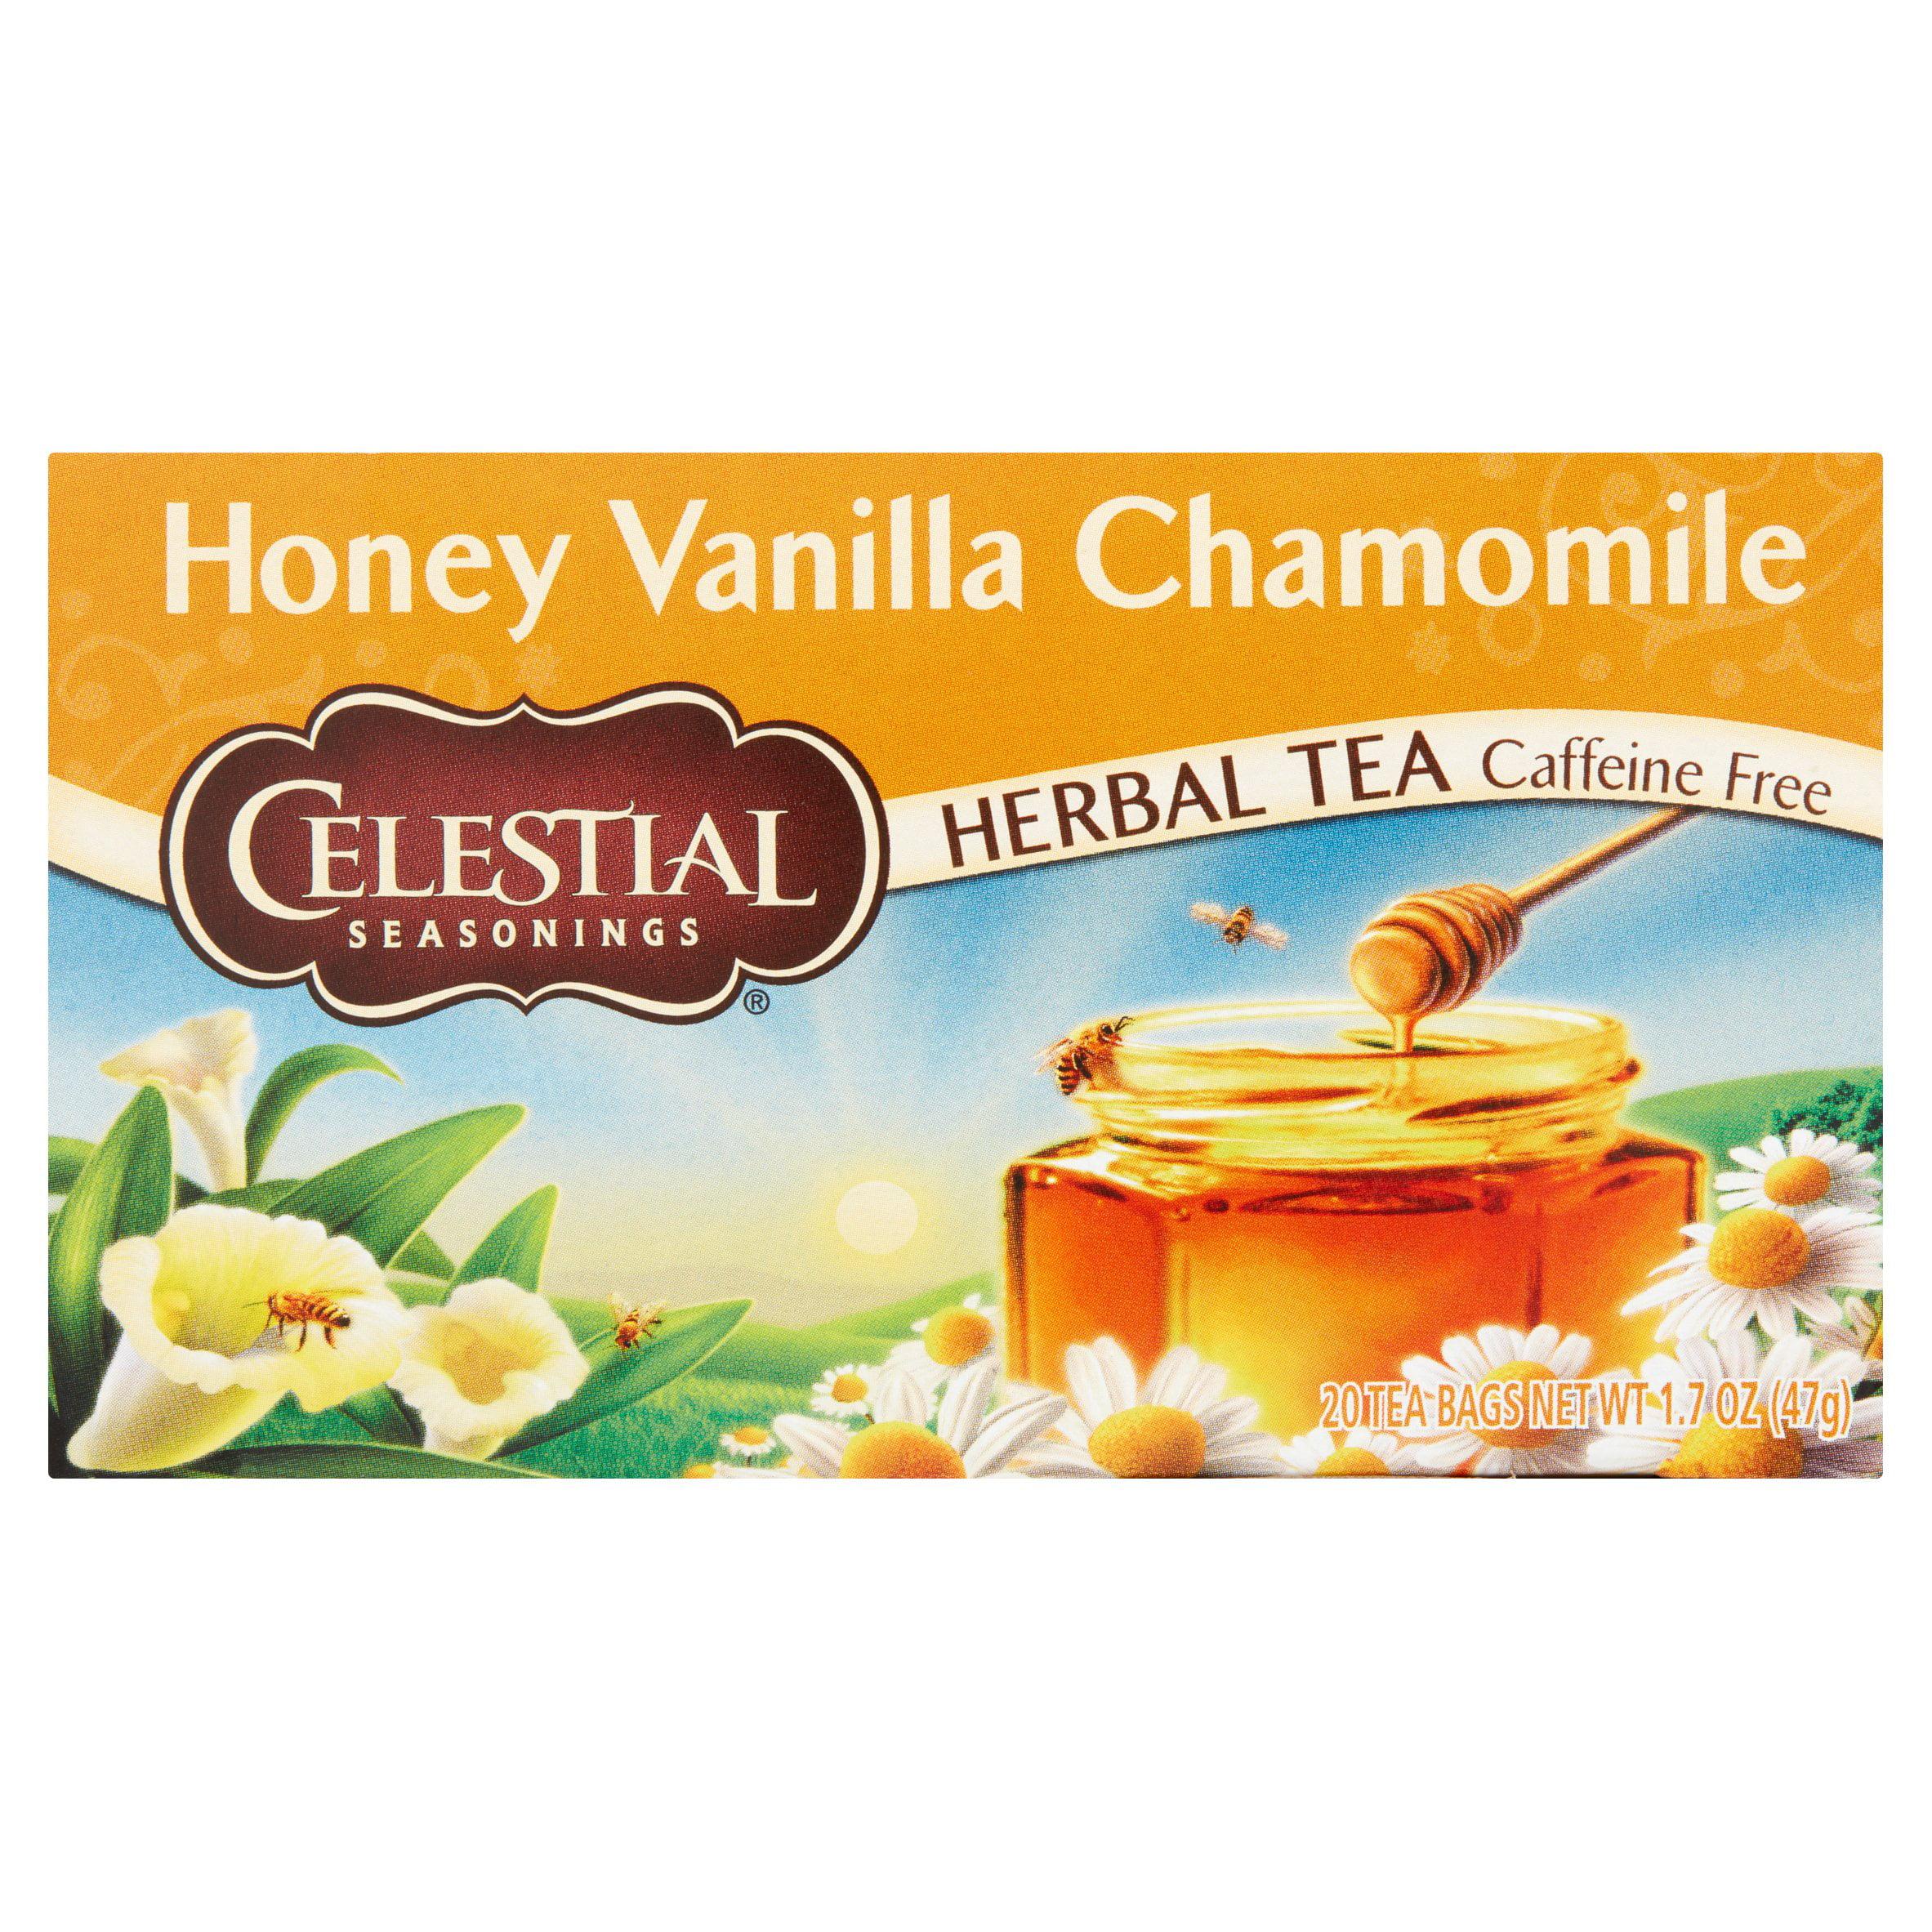 Celestial Seasonings Honey Vanilla Chamomile Herbal Tea Bags 20 ct Box by Celestial Seasonings, Inc., the Hain Celestial Group, Inc.